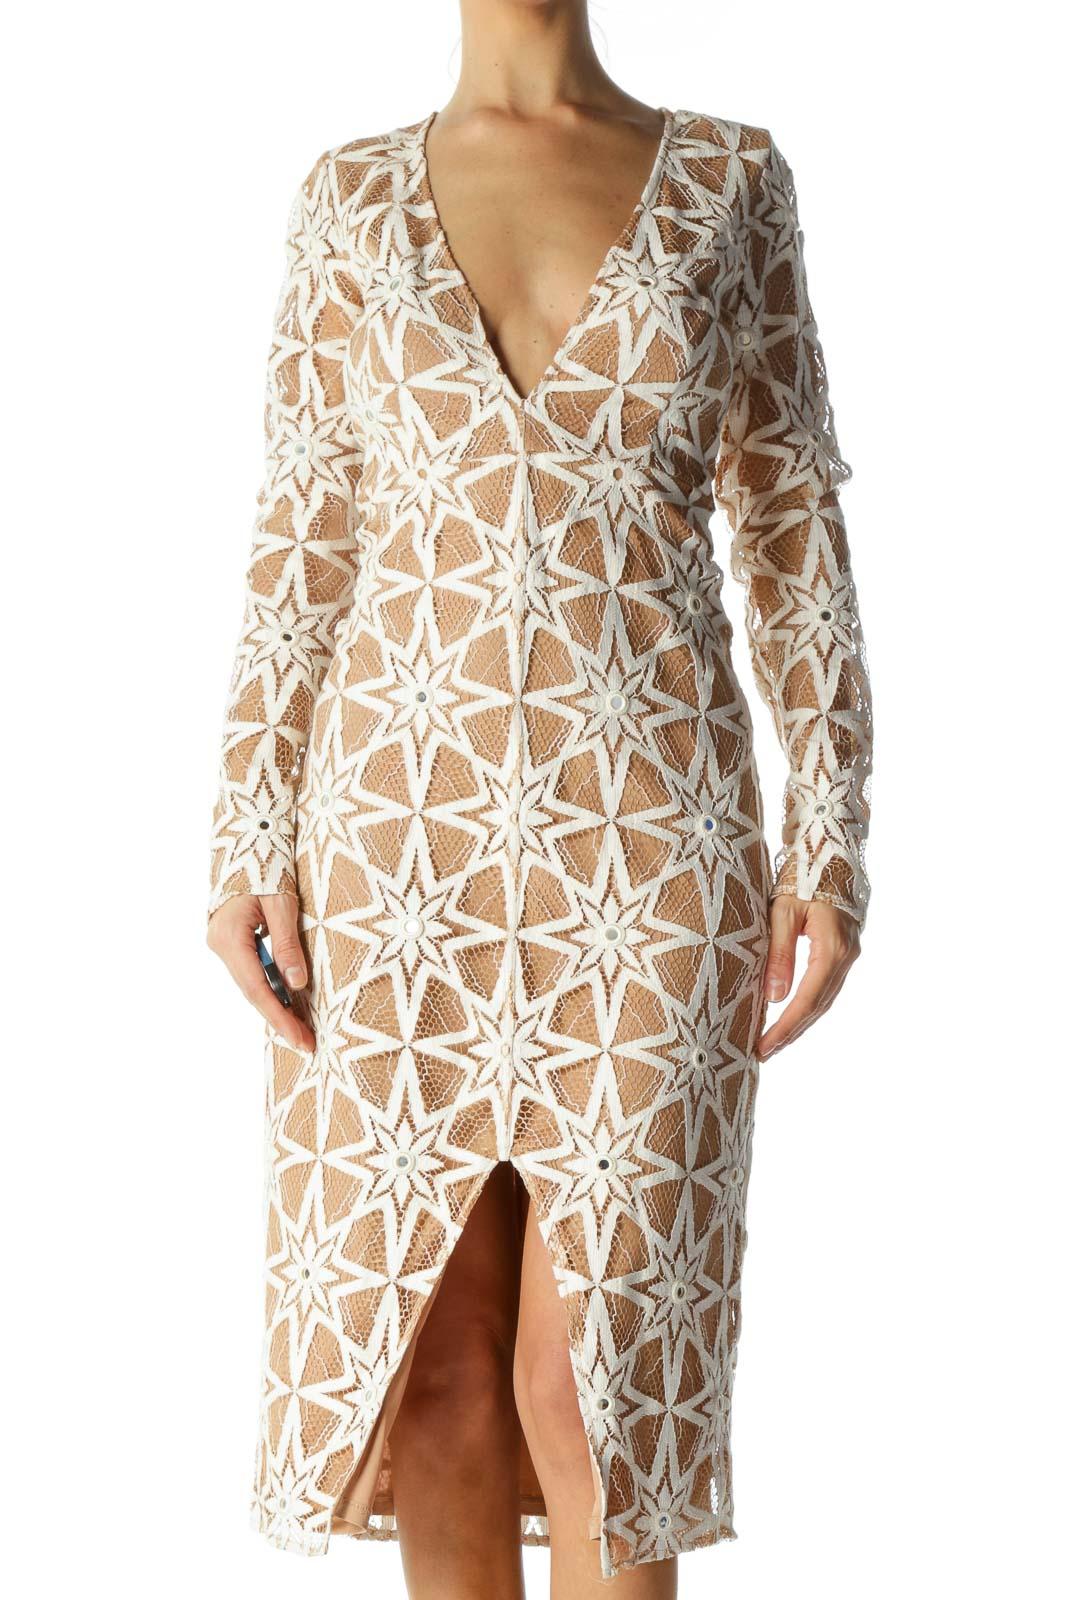 Cream Star & Sequin Crocheted Deep-V-Neck Fit Dress Front